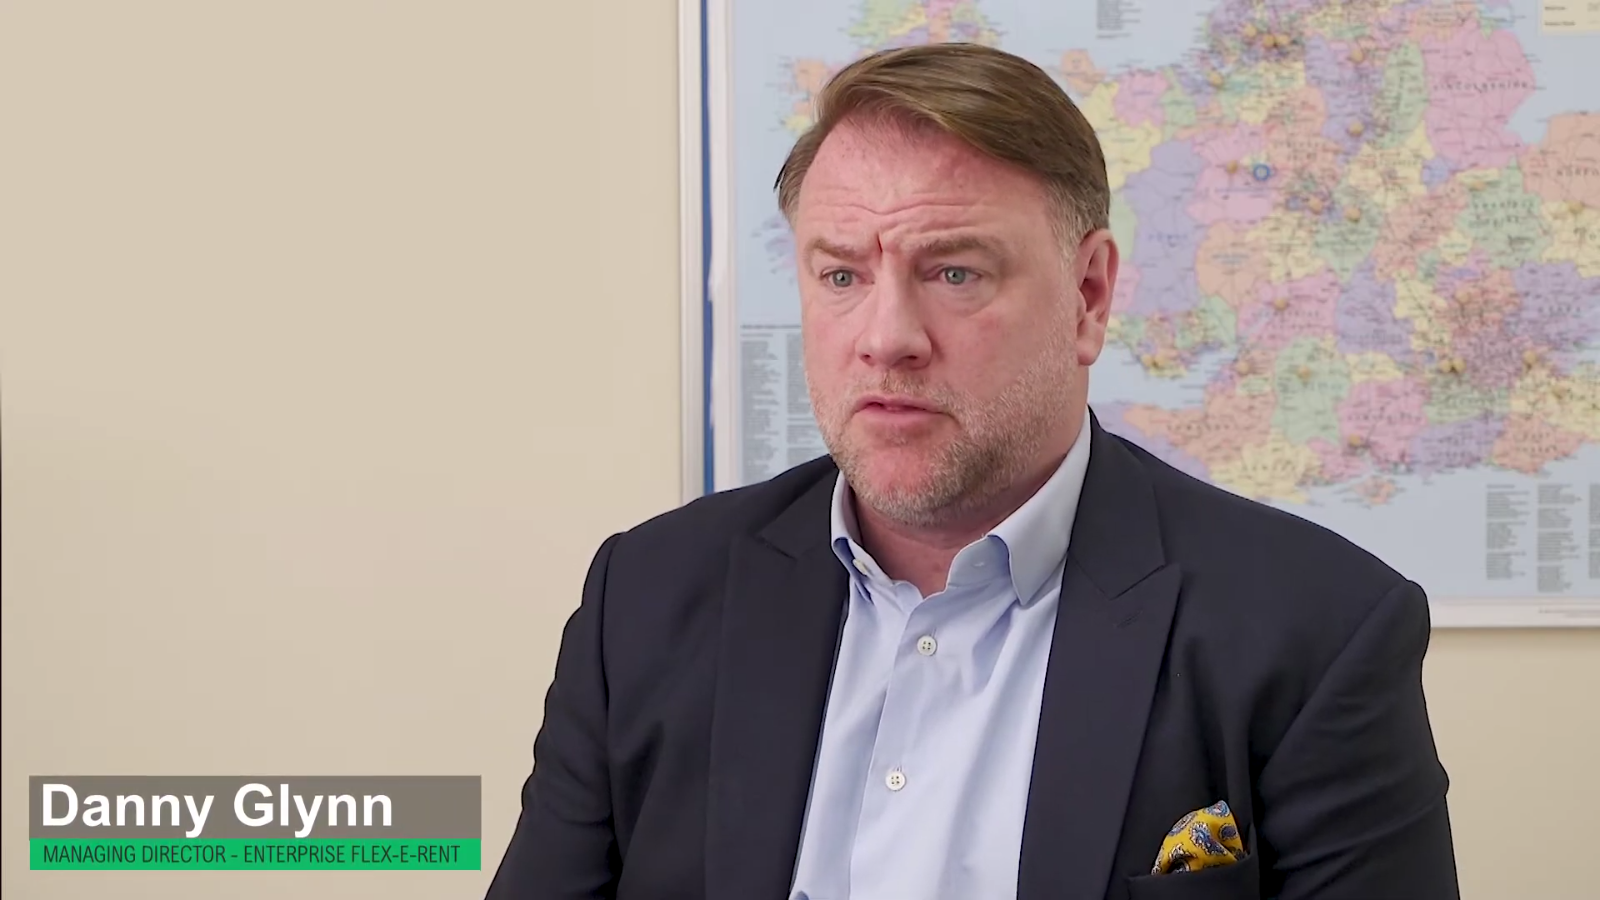 Direct Vision Standards & Brexit – Update from Enterprise Flex-E-Rent Managing Director, Danny Glynn